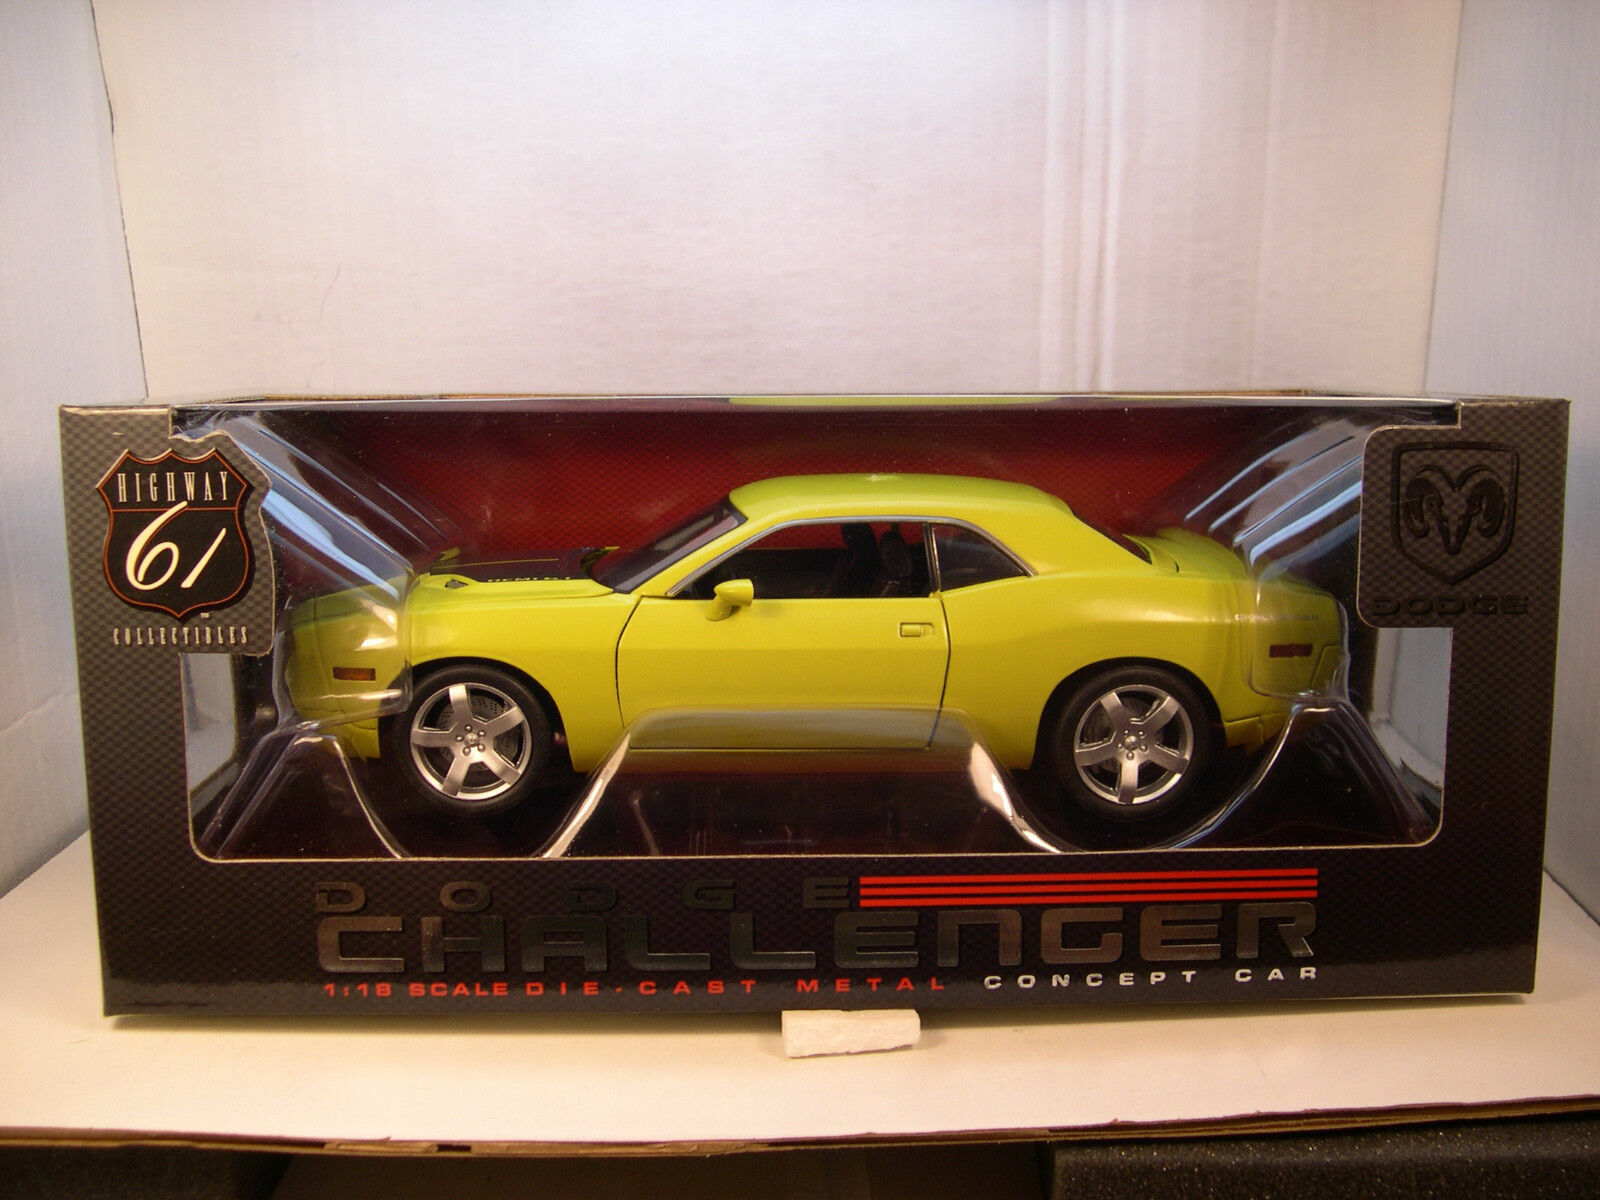 Amarillo 2006 Dodge Challenger R R R t Highway 61 DCP Coche de Metal Diecast Escala 1 18 ed6d0f